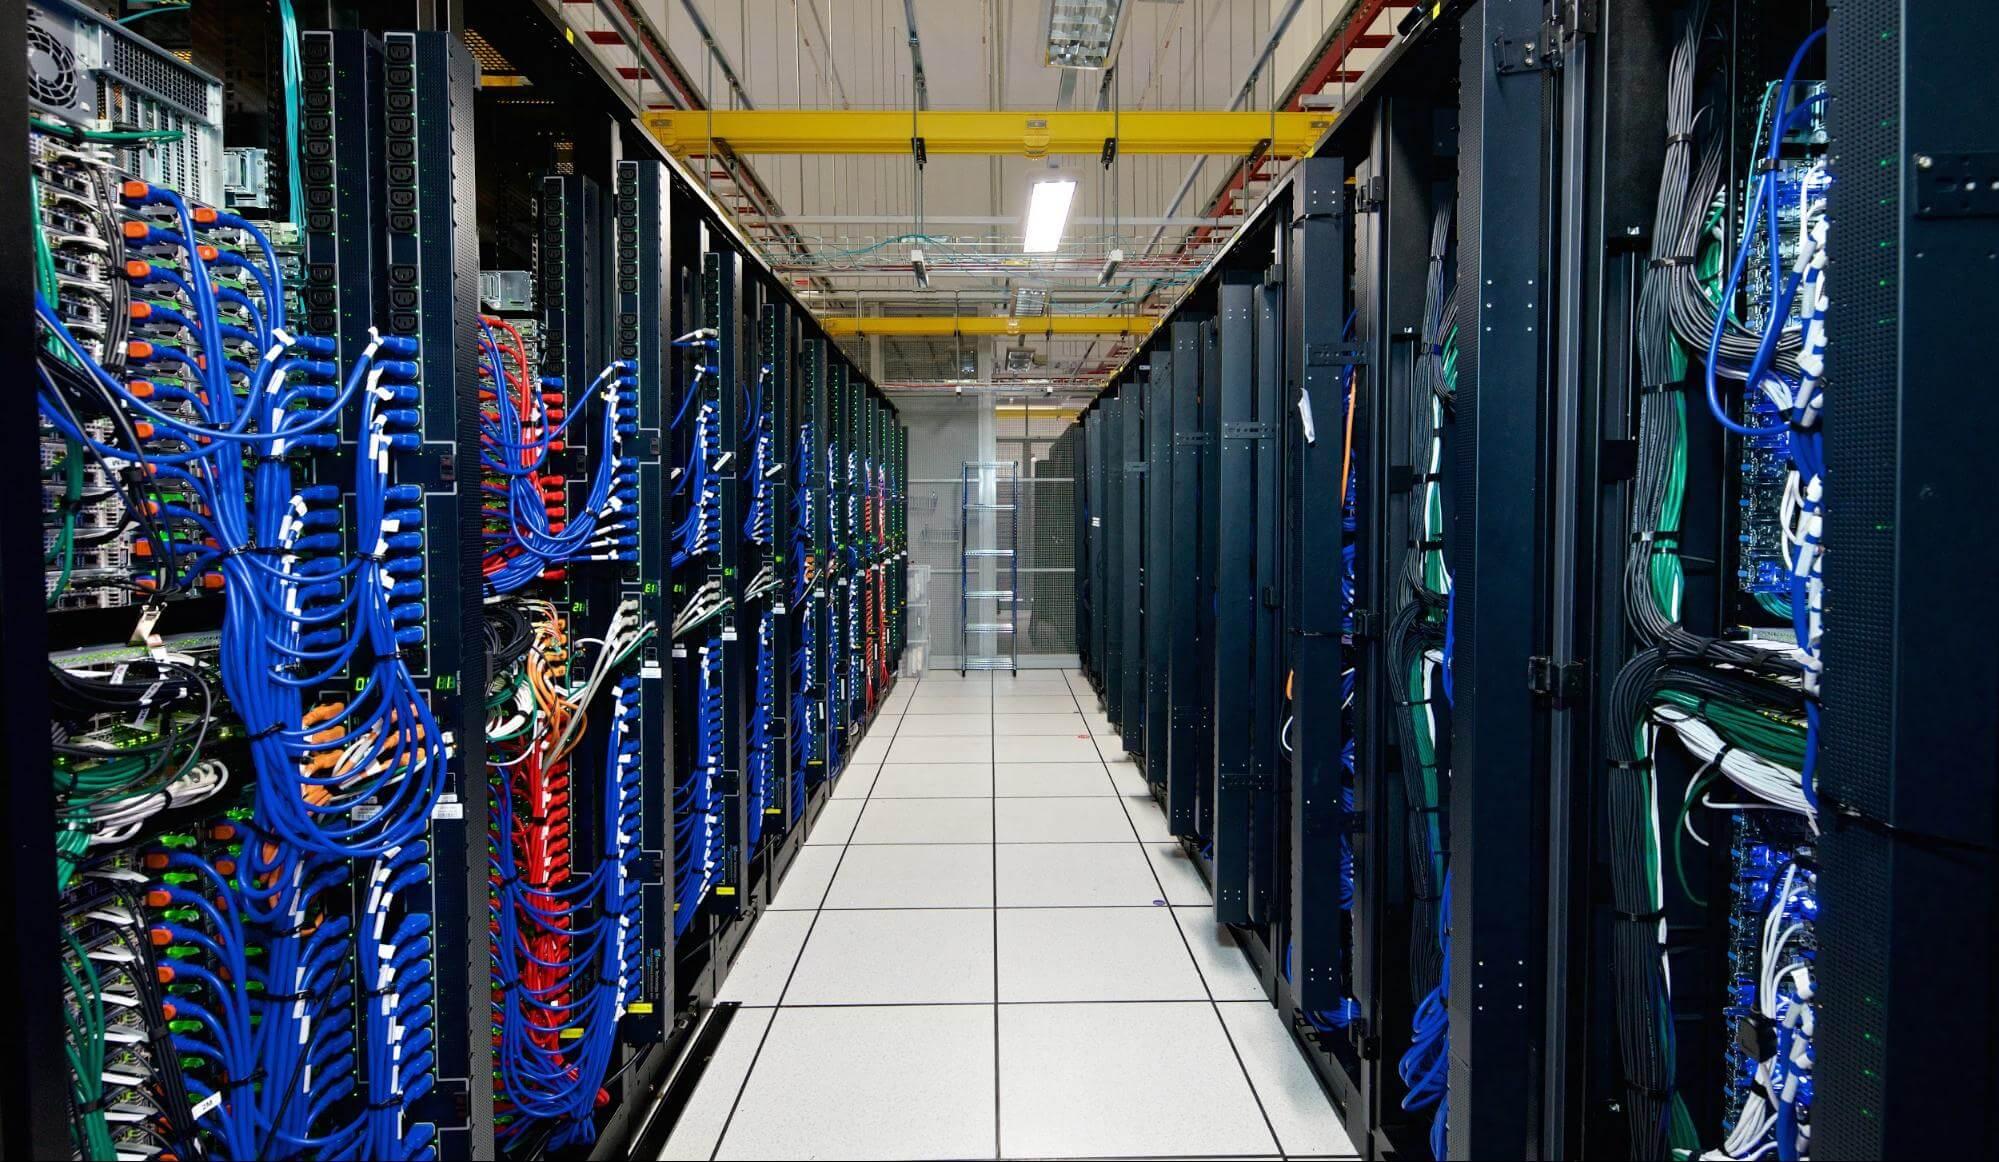 Inside SGP1, our Singapore datacenter region